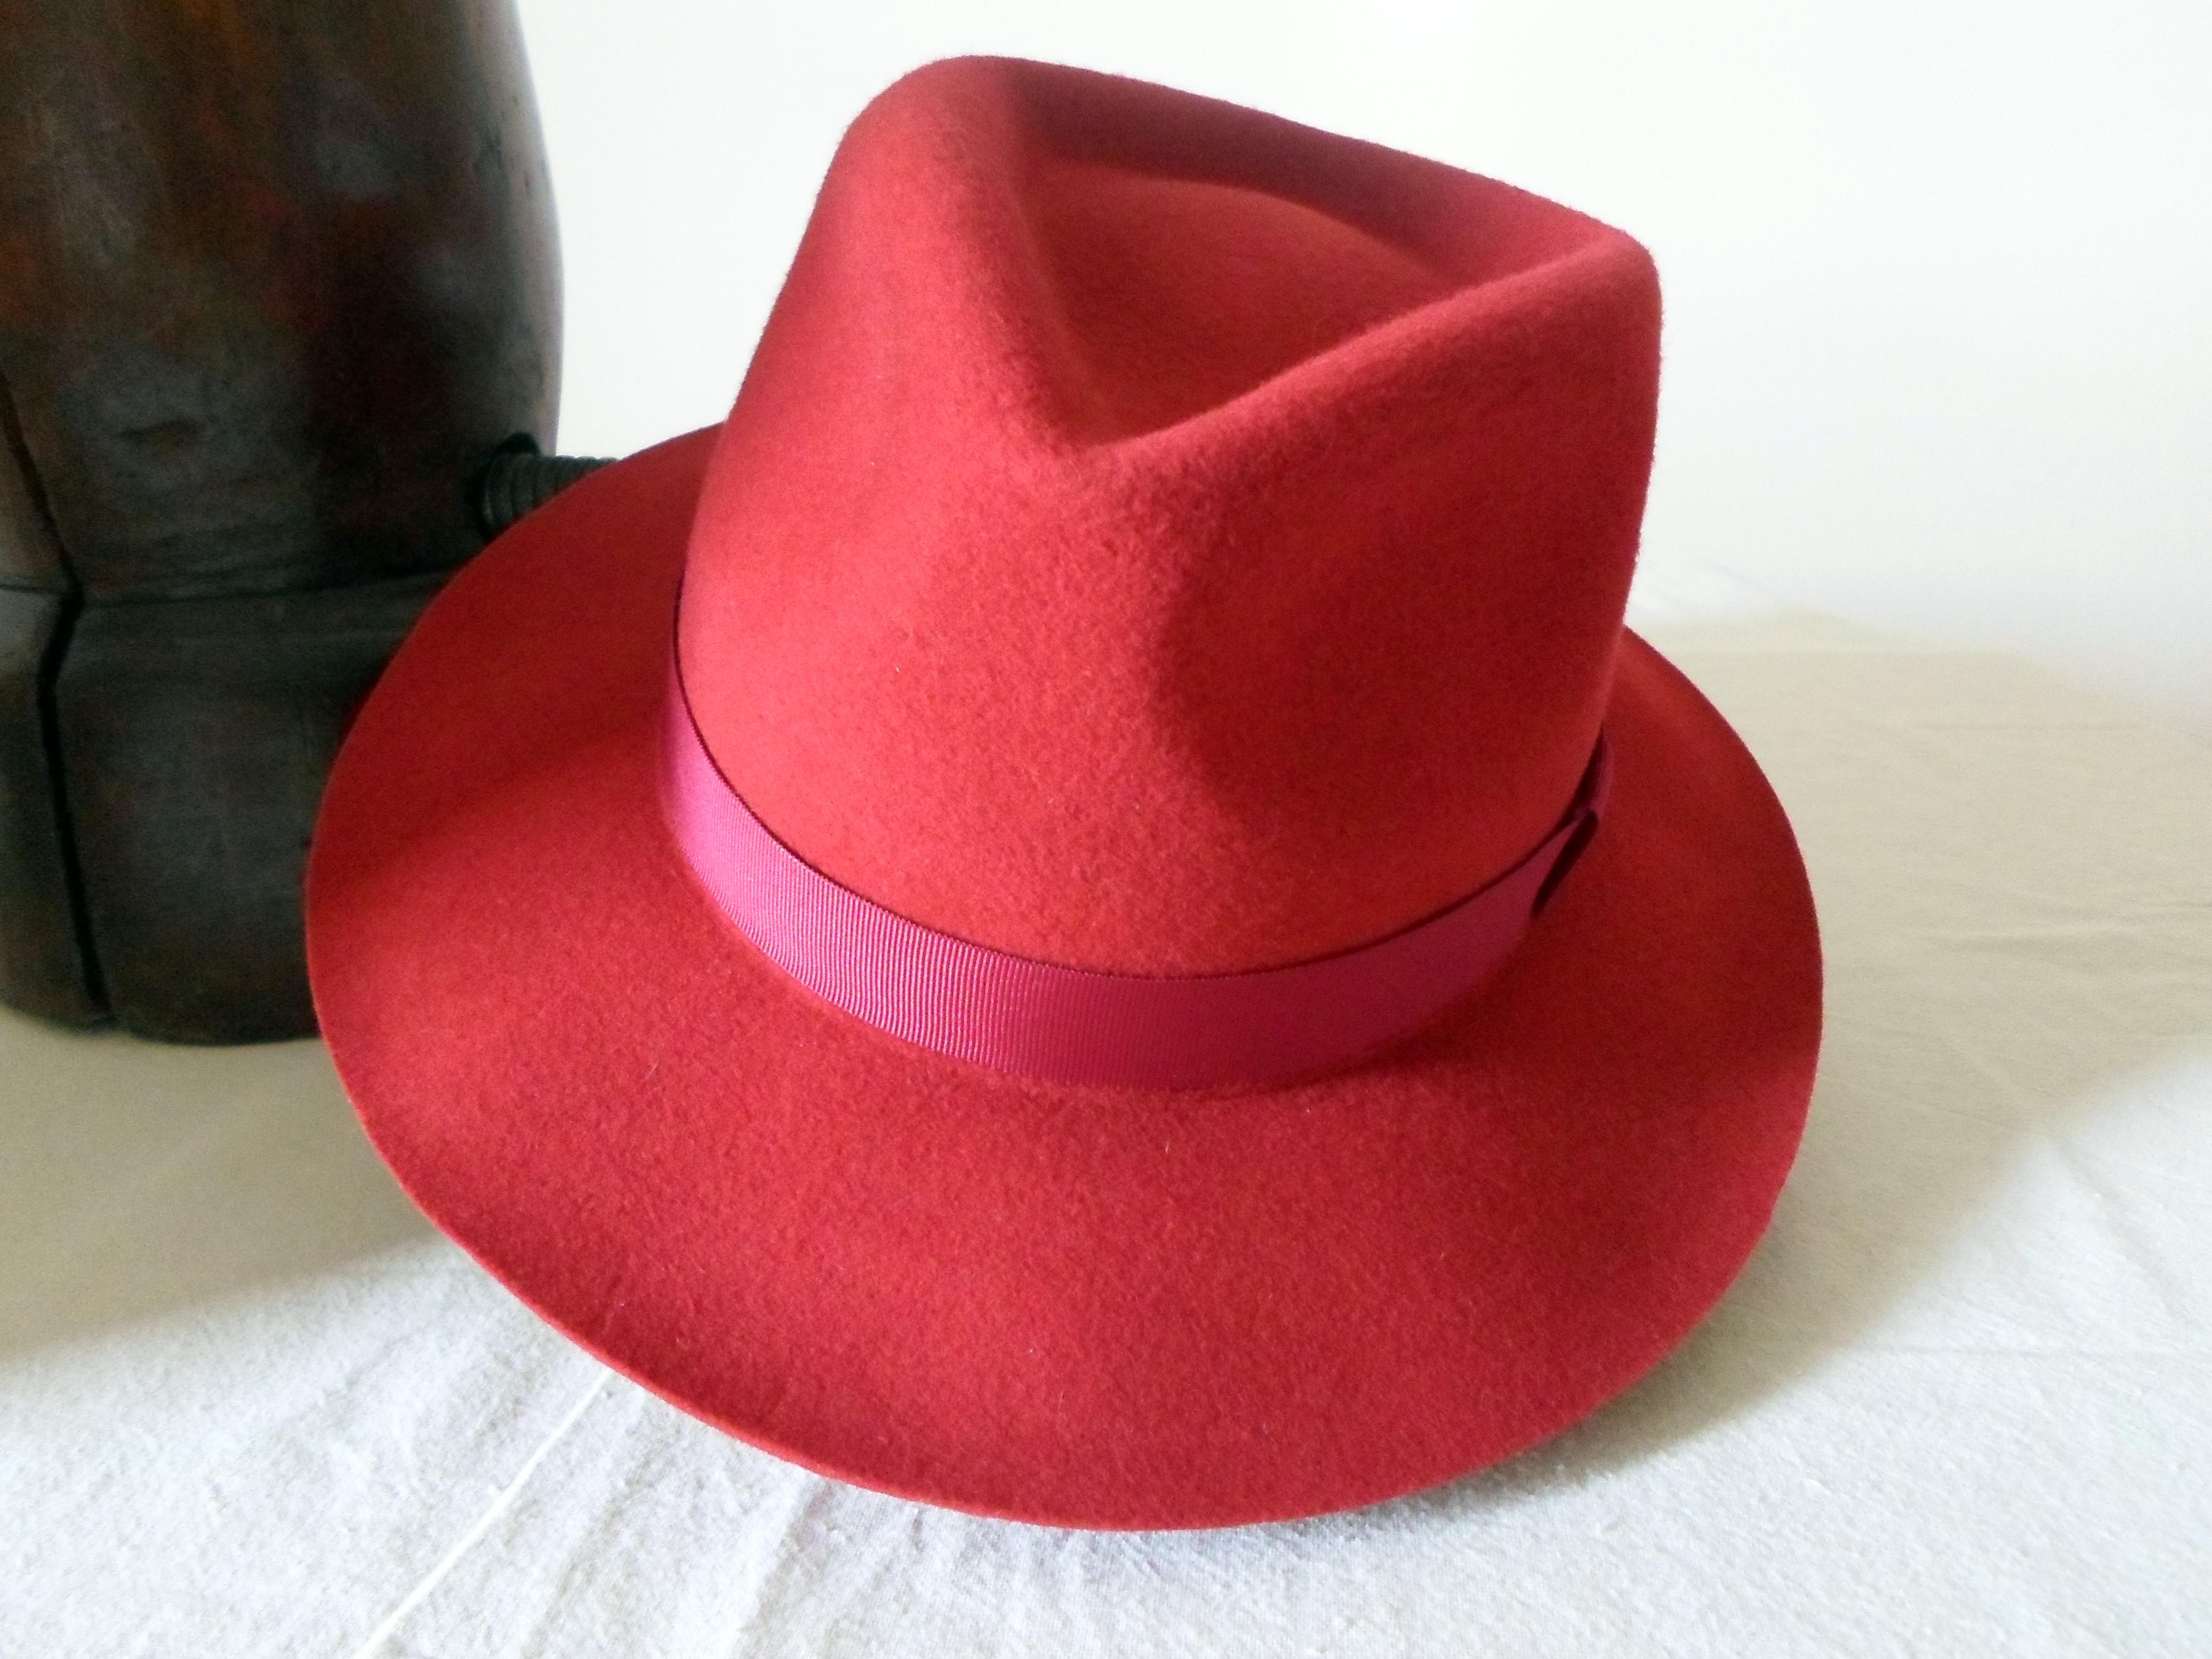 Red Wool Felt Fedora - Wide Brim Merino Wool Felt Handmade Fedora ... c9fb349b410